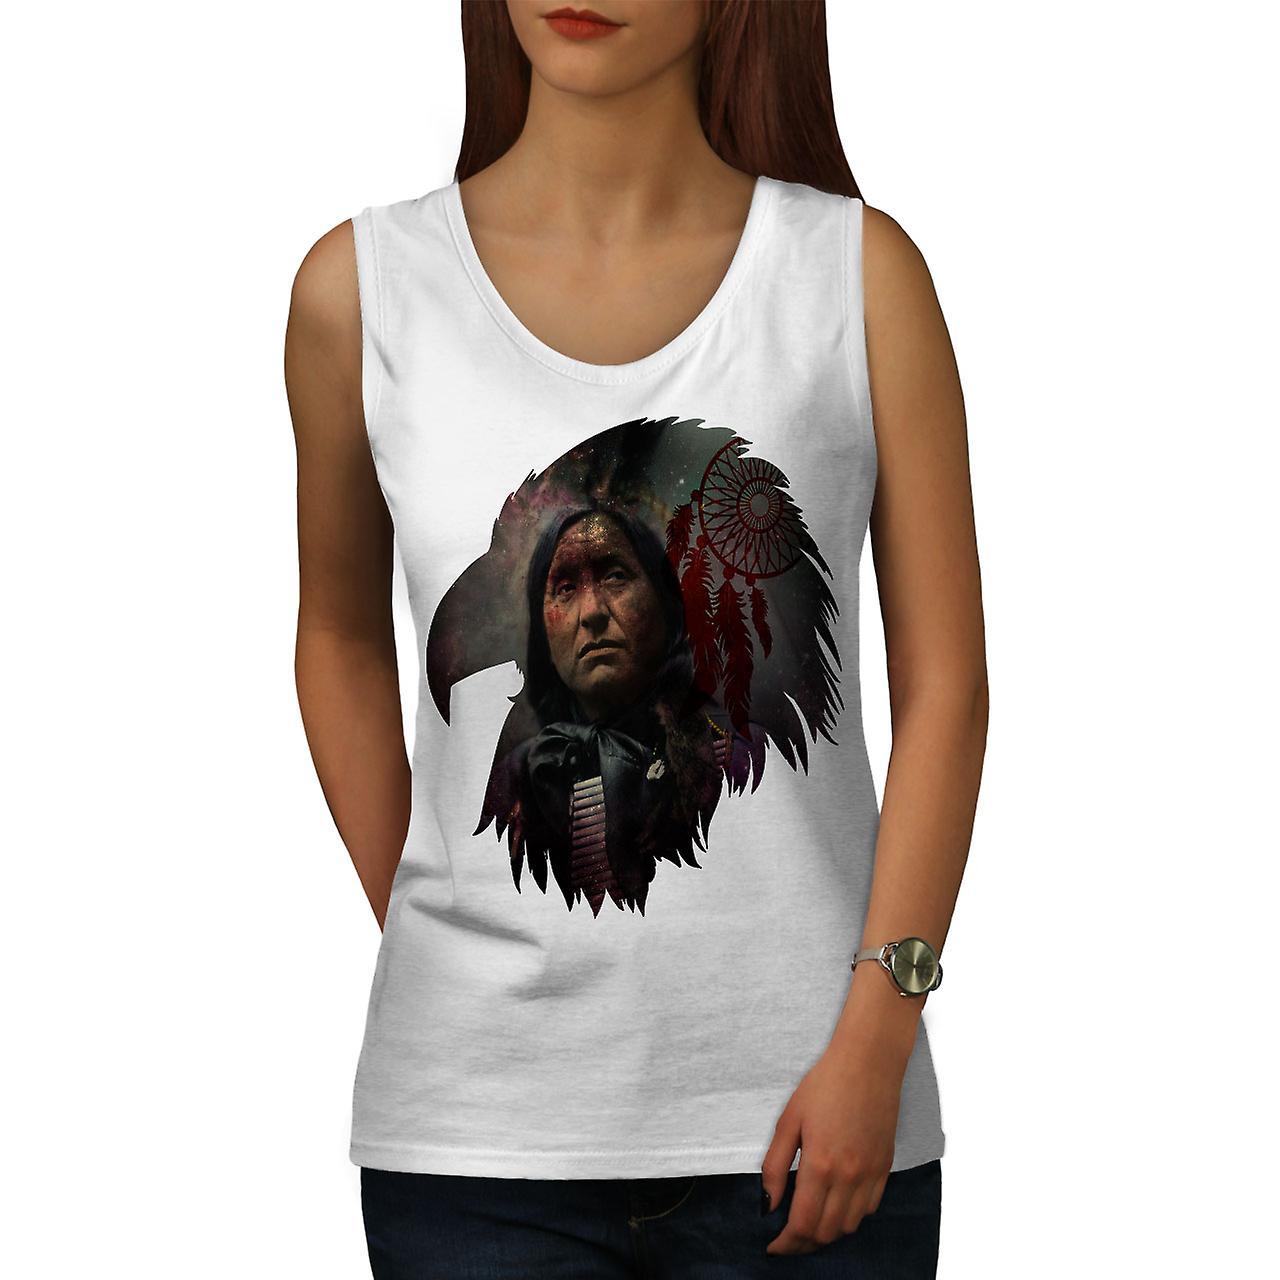 Indian Chief Cool Women Whitetank Top Wellcoda Fruugo